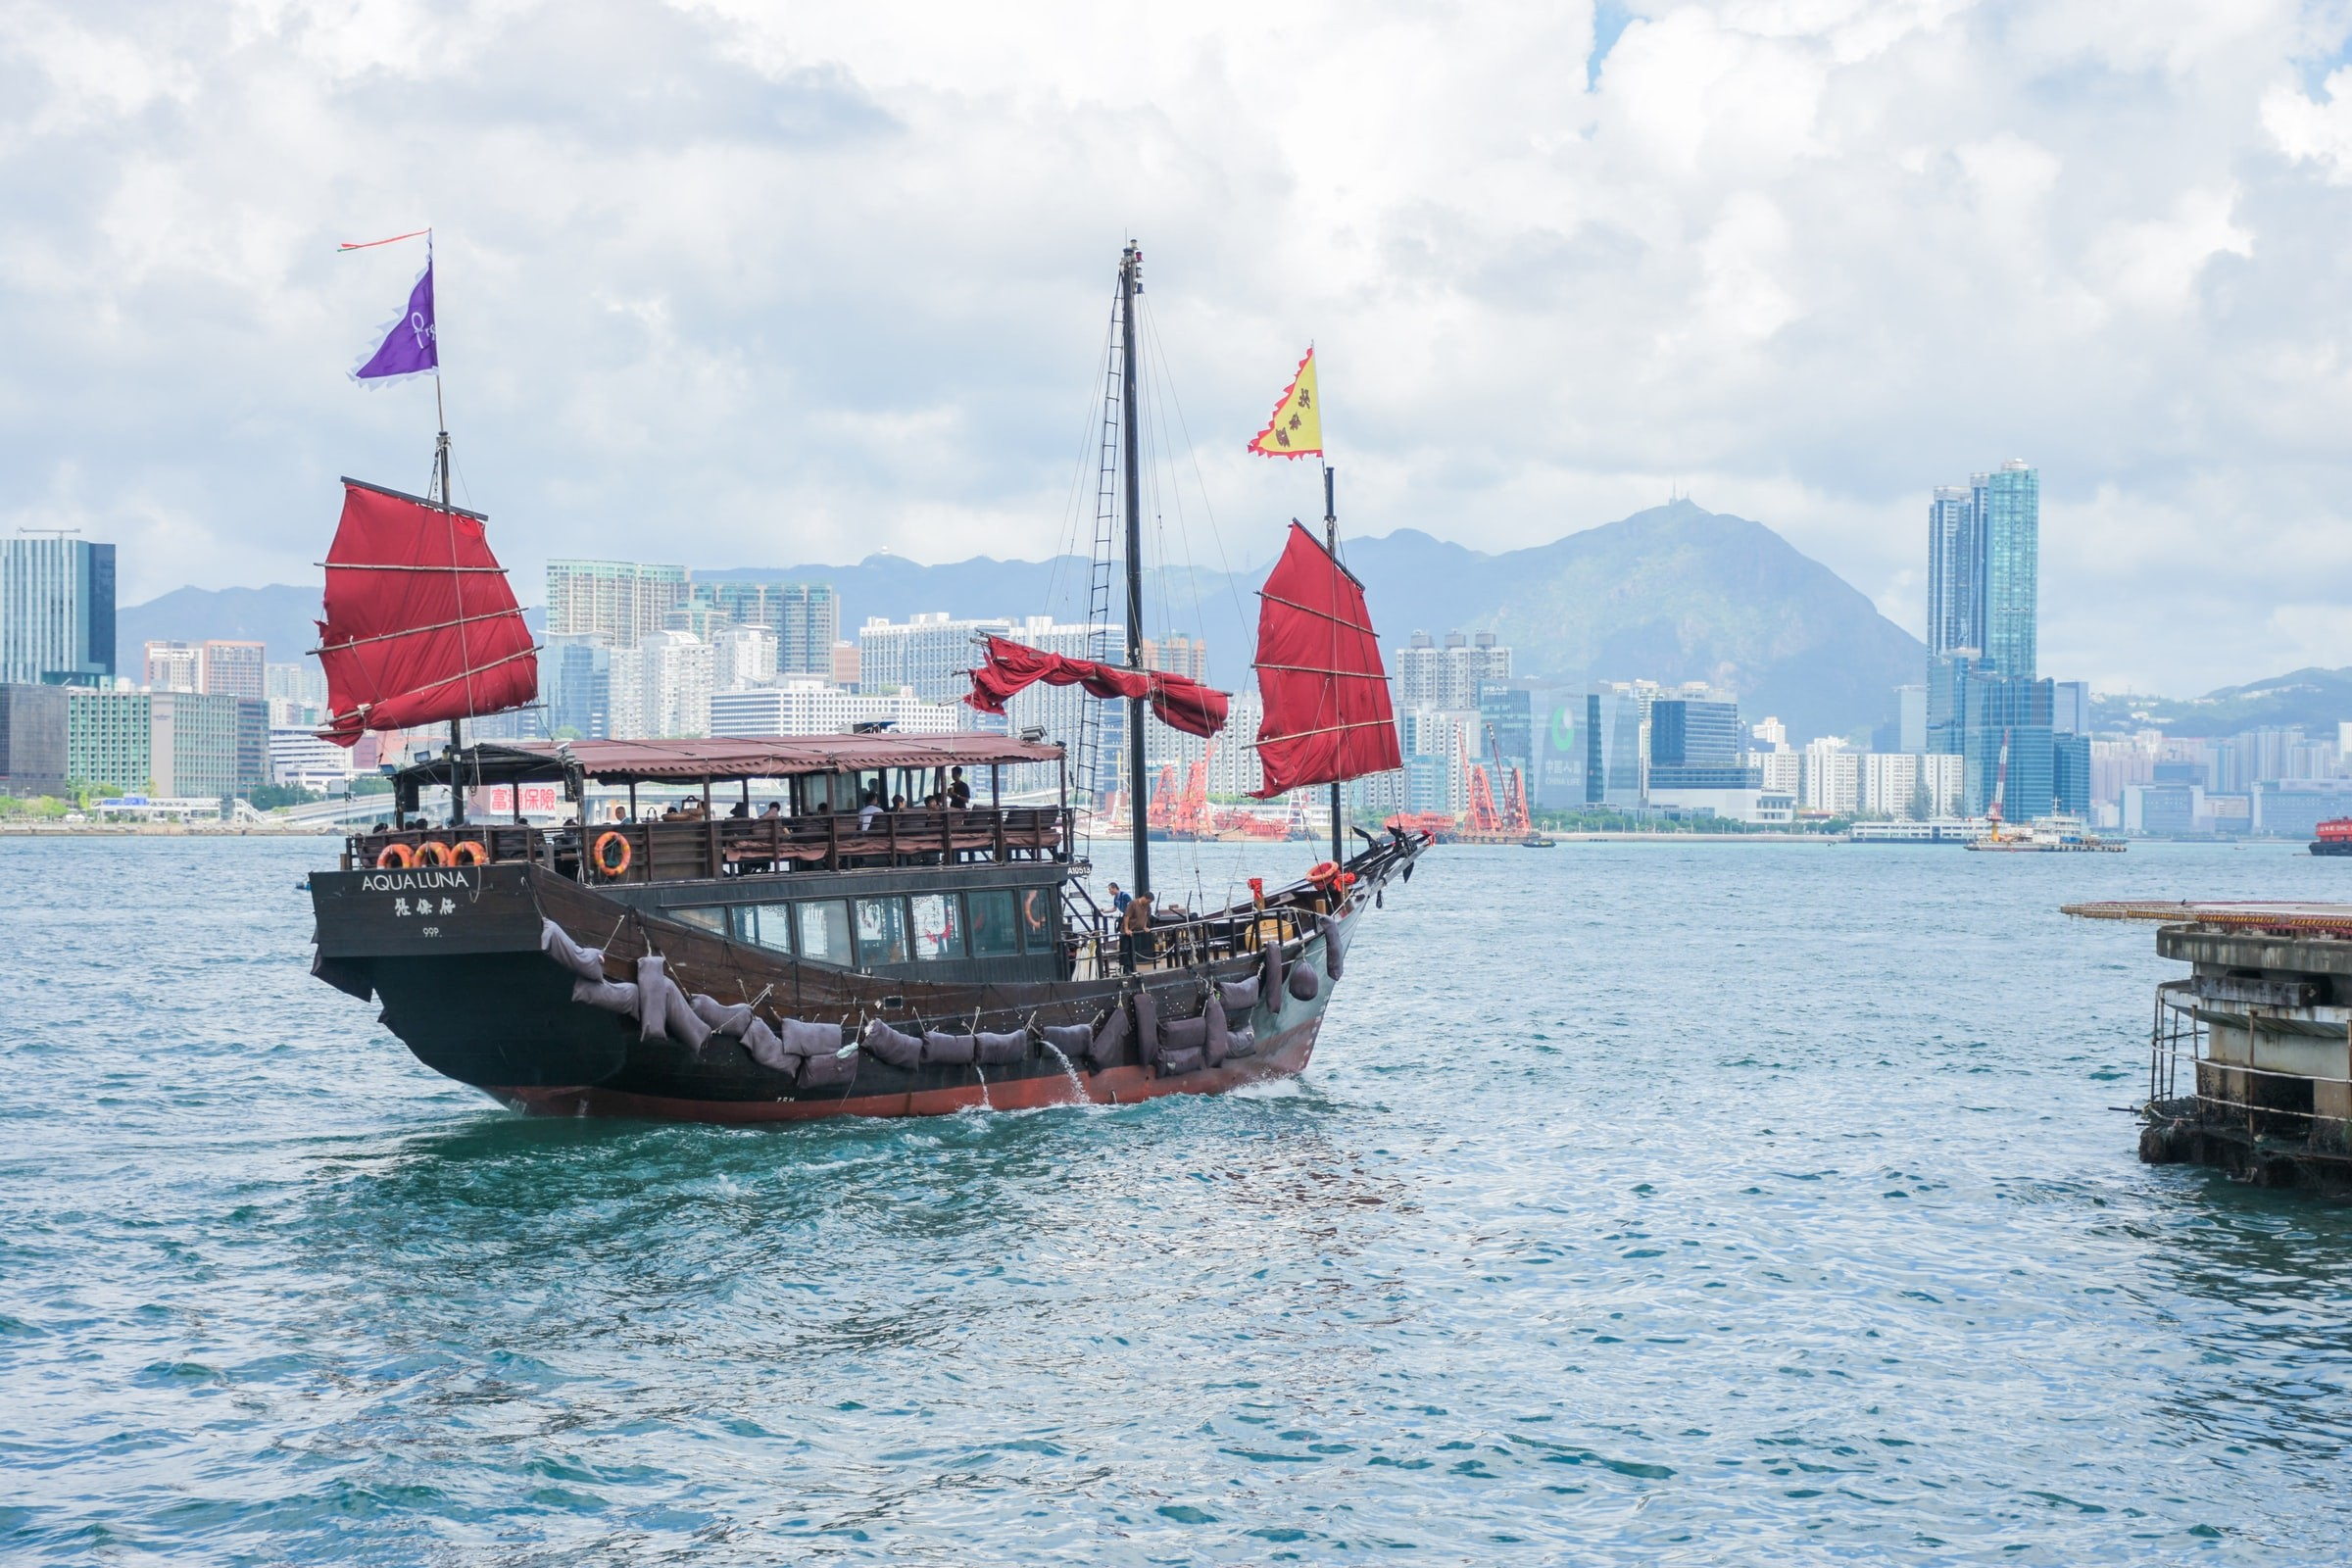 Hong Kong Singapore air travel bubble travel news update